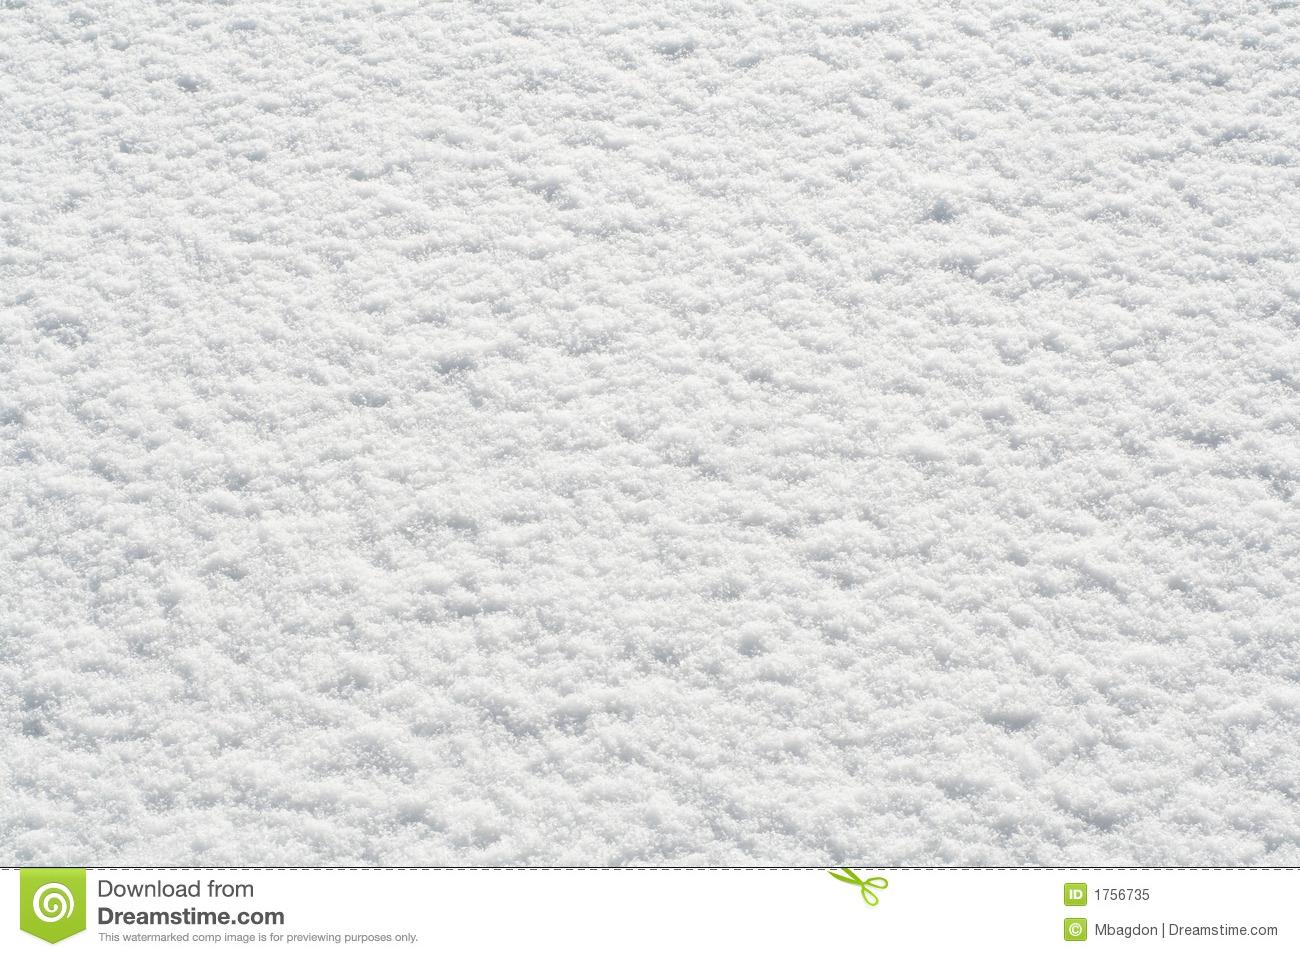 Snowy Ground Clipart - Clipart Kid